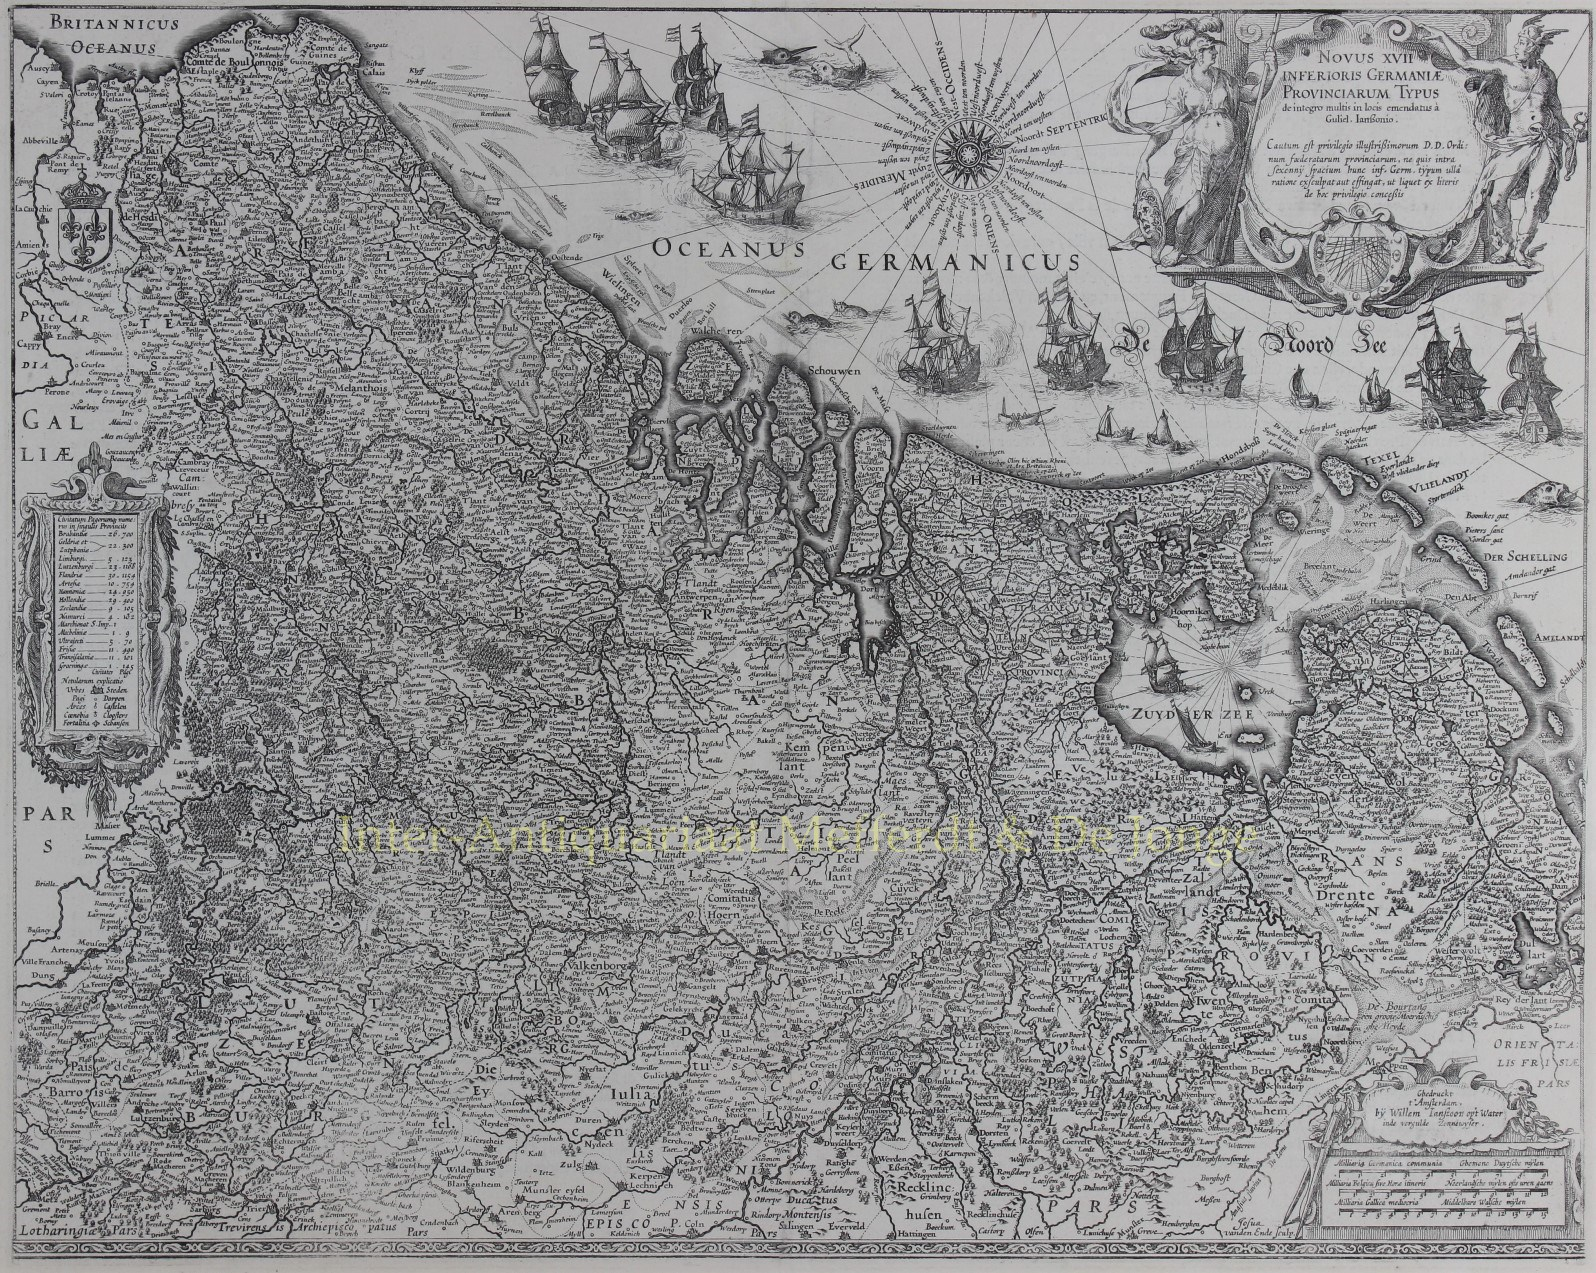 BLAEU,  WILLEM - Zeventien Provinciën - Willem Blaeu, 1630